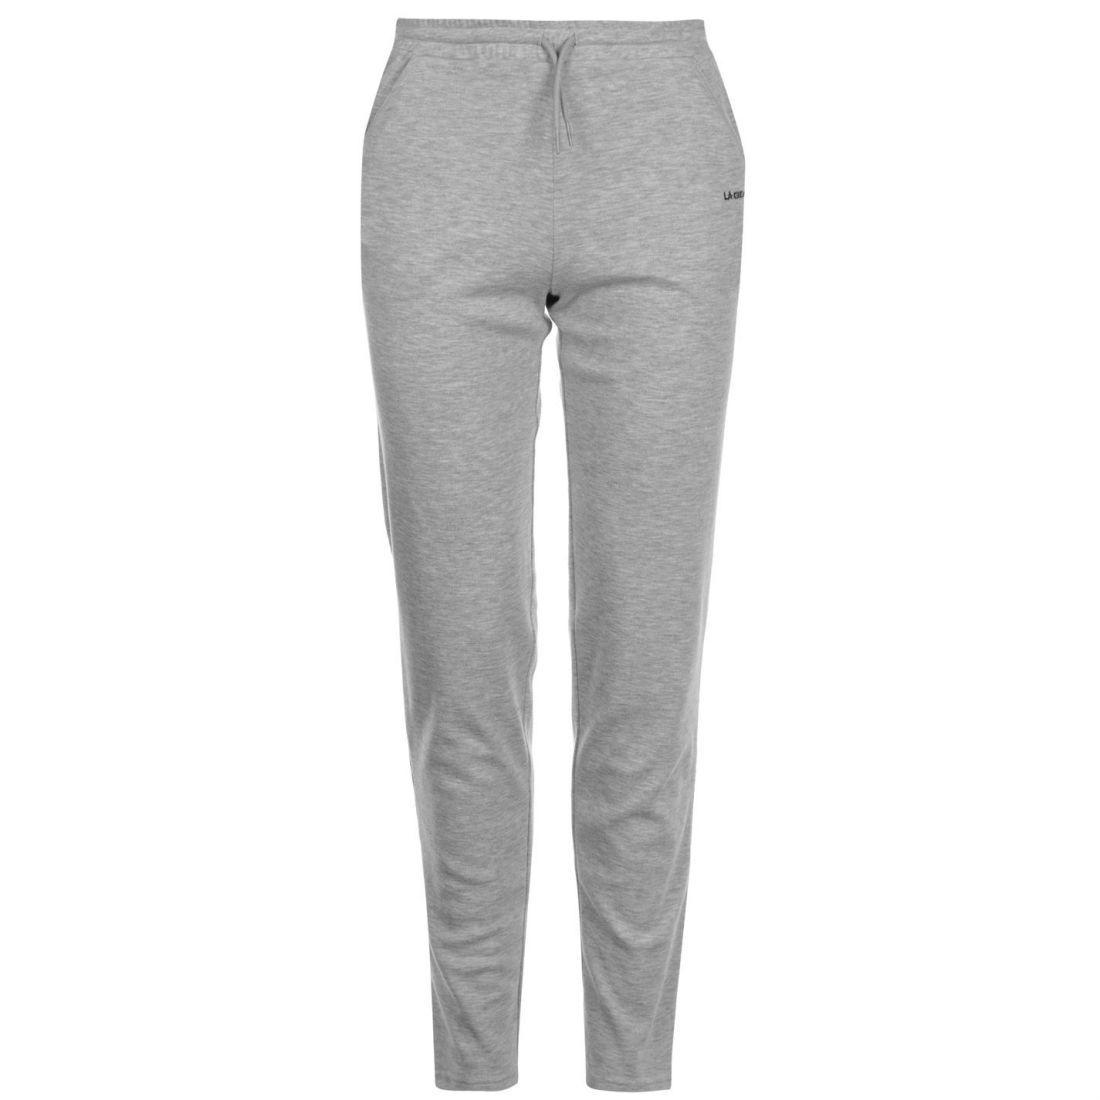 La Gear I LK Pants Sports Running Jogging Joggers Womens Ladies Grey ... 3433ce178